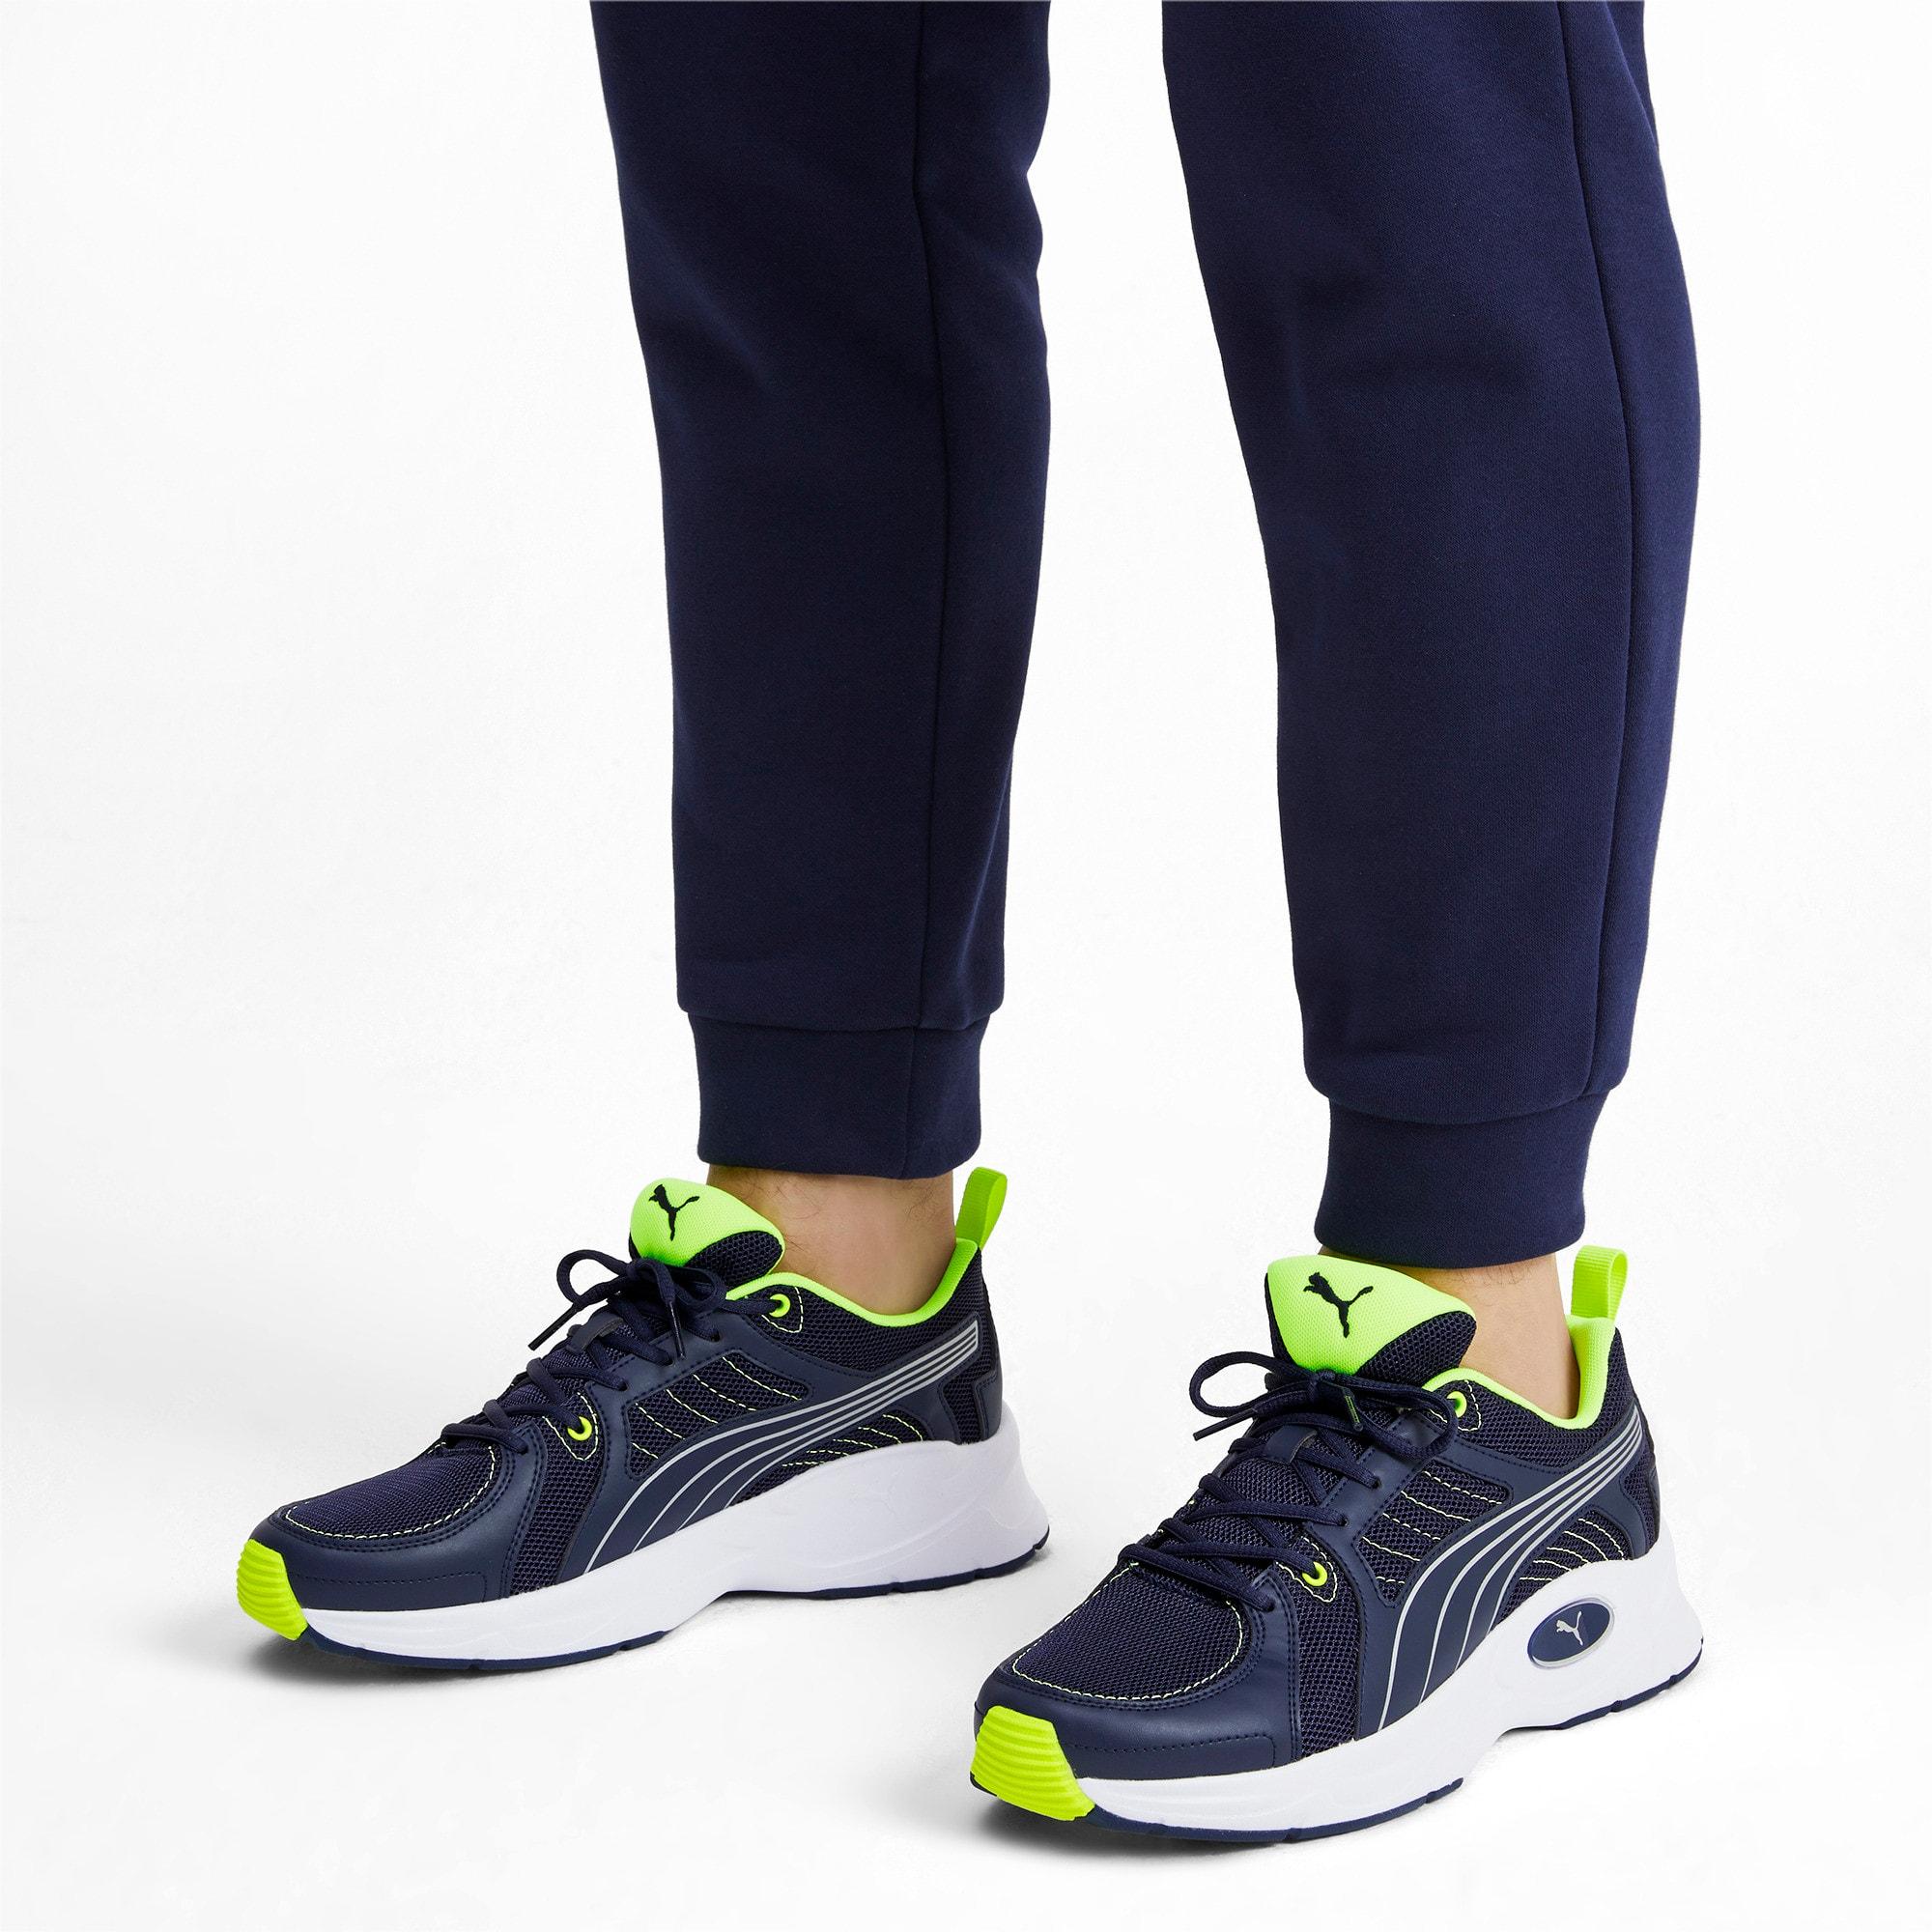 Thumbnail 2 of Nucleus Run Training Shoes, Peacoat-Puma Silver, medium-IND